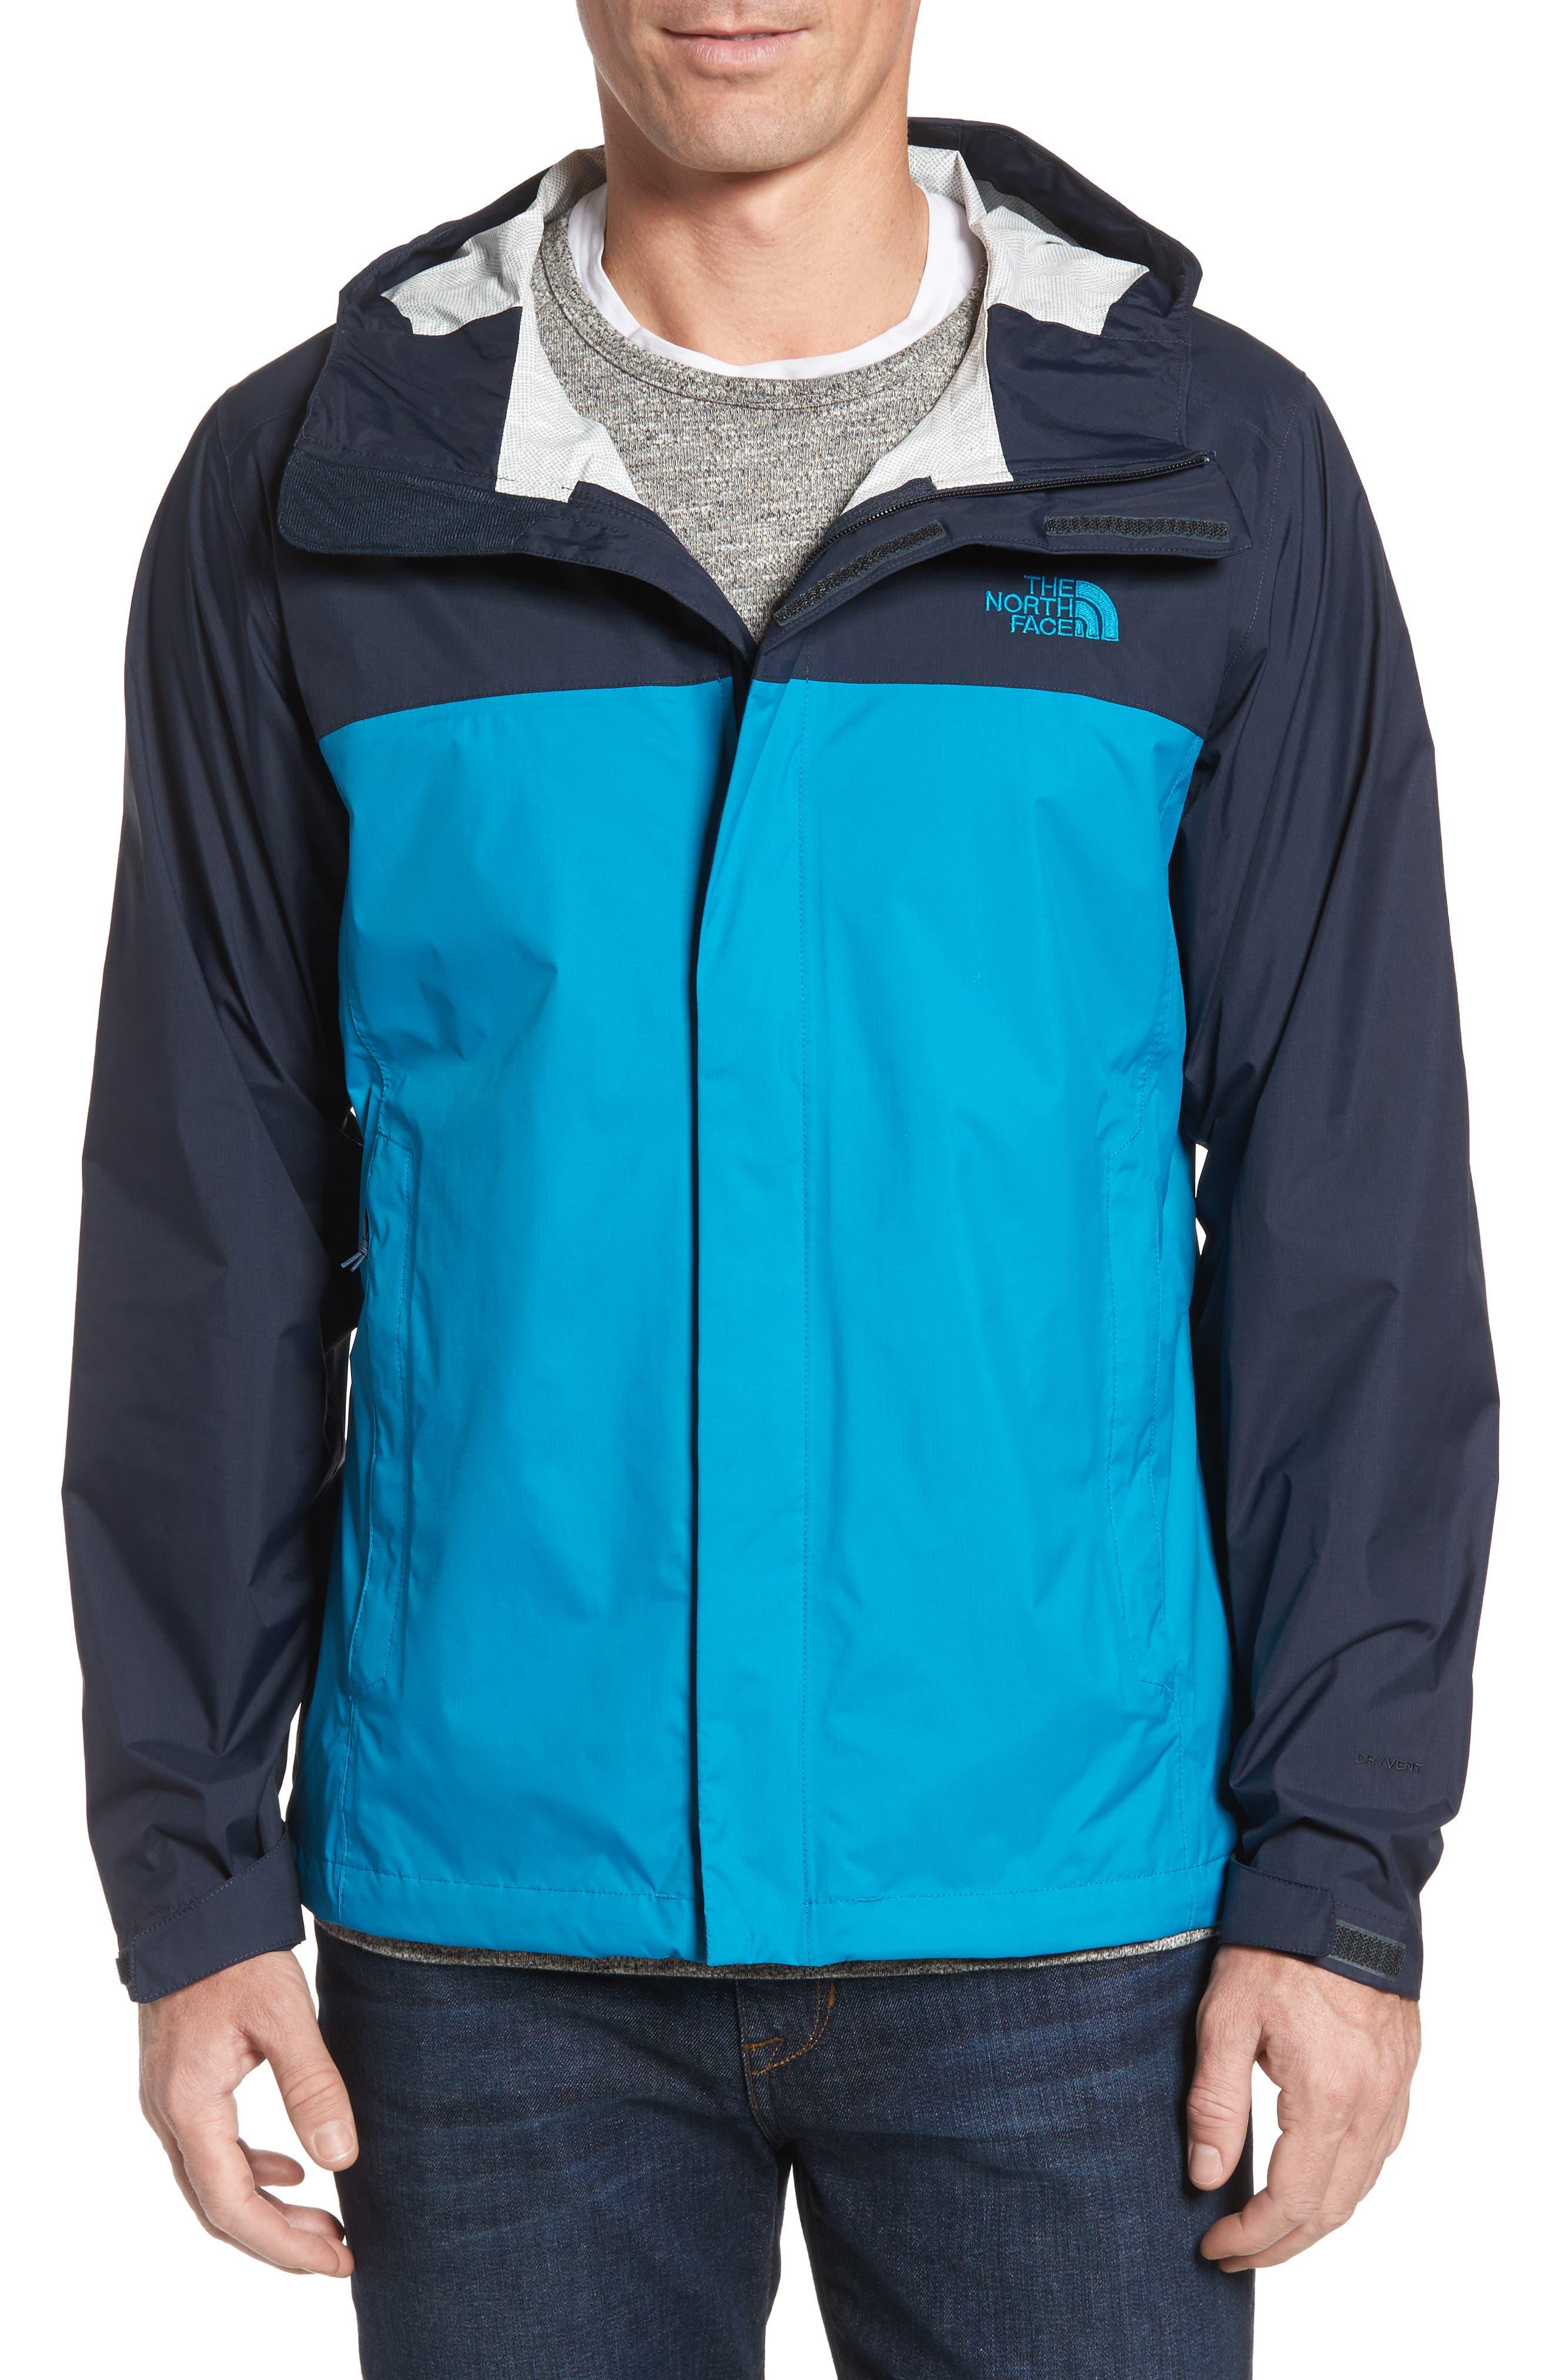 The North Face Venture II Raincoat